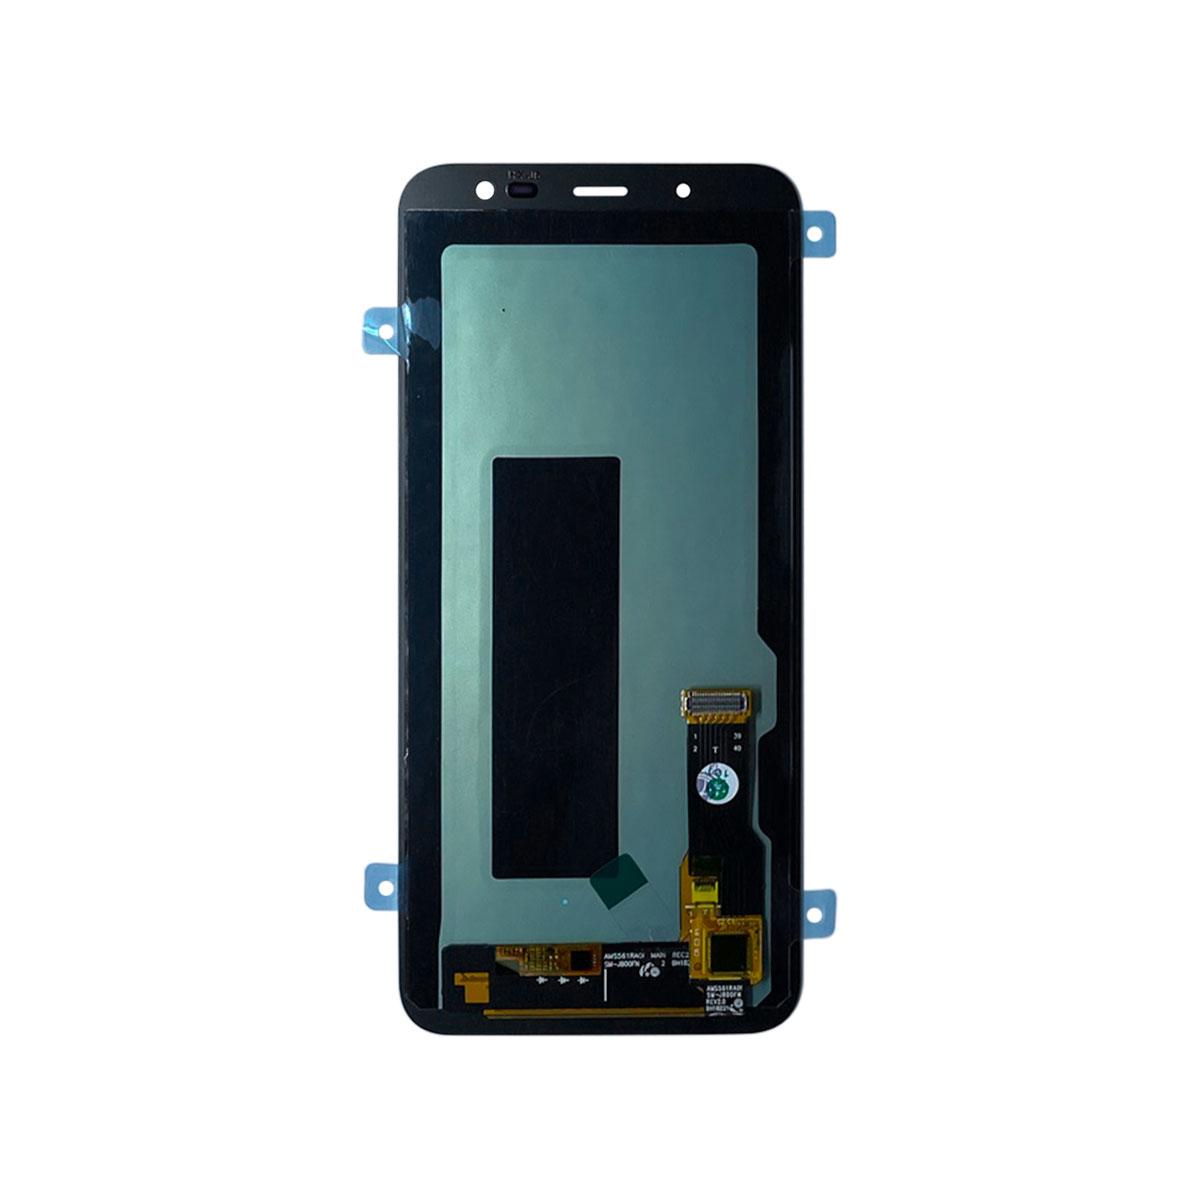 Tela Display Frontal Lcd Compatível J6 J600 Empório Premium